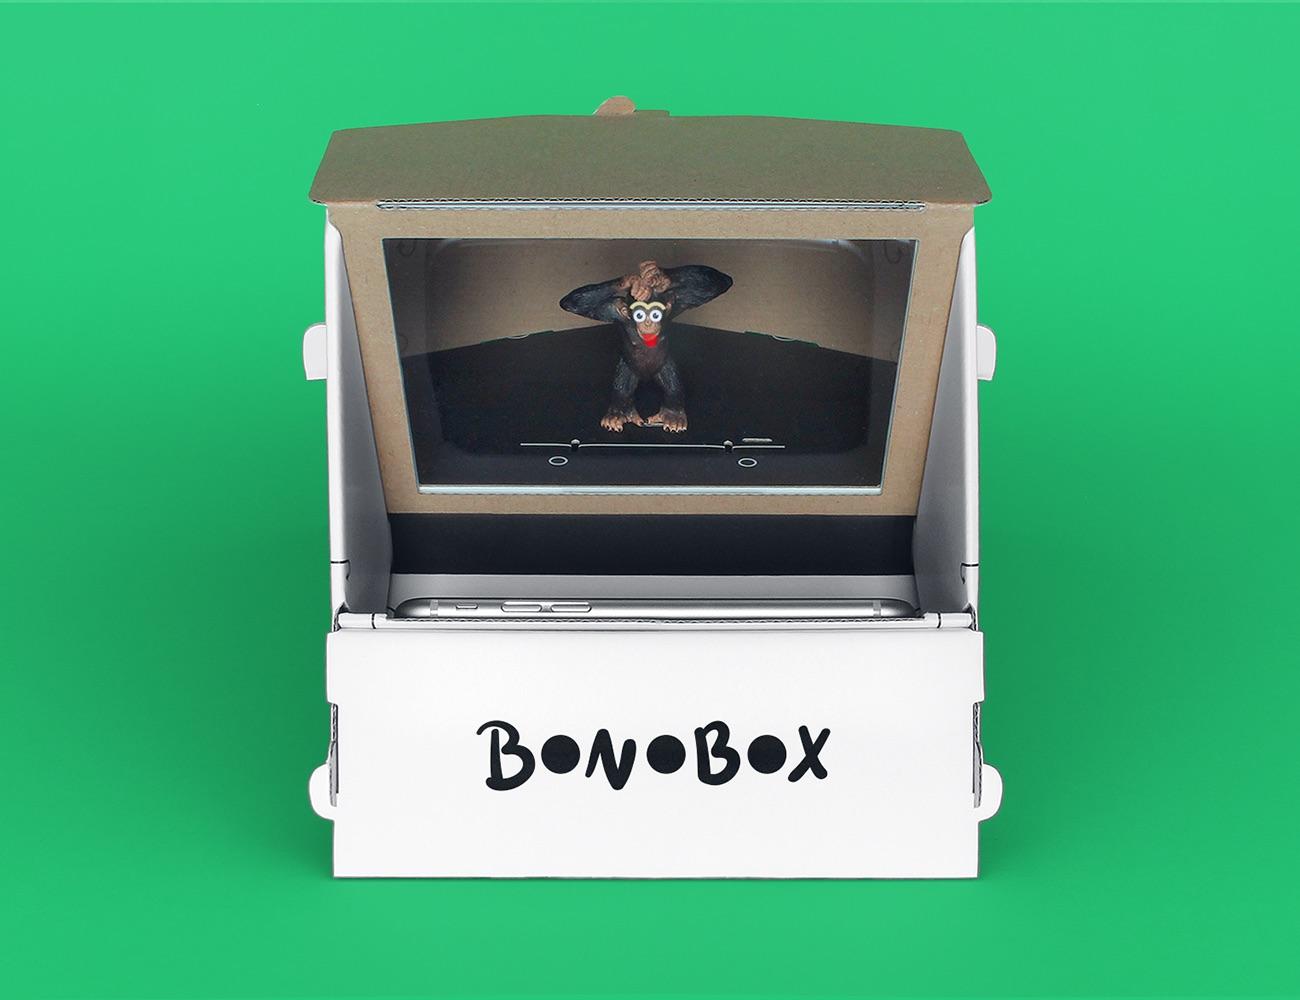 bonobox-01